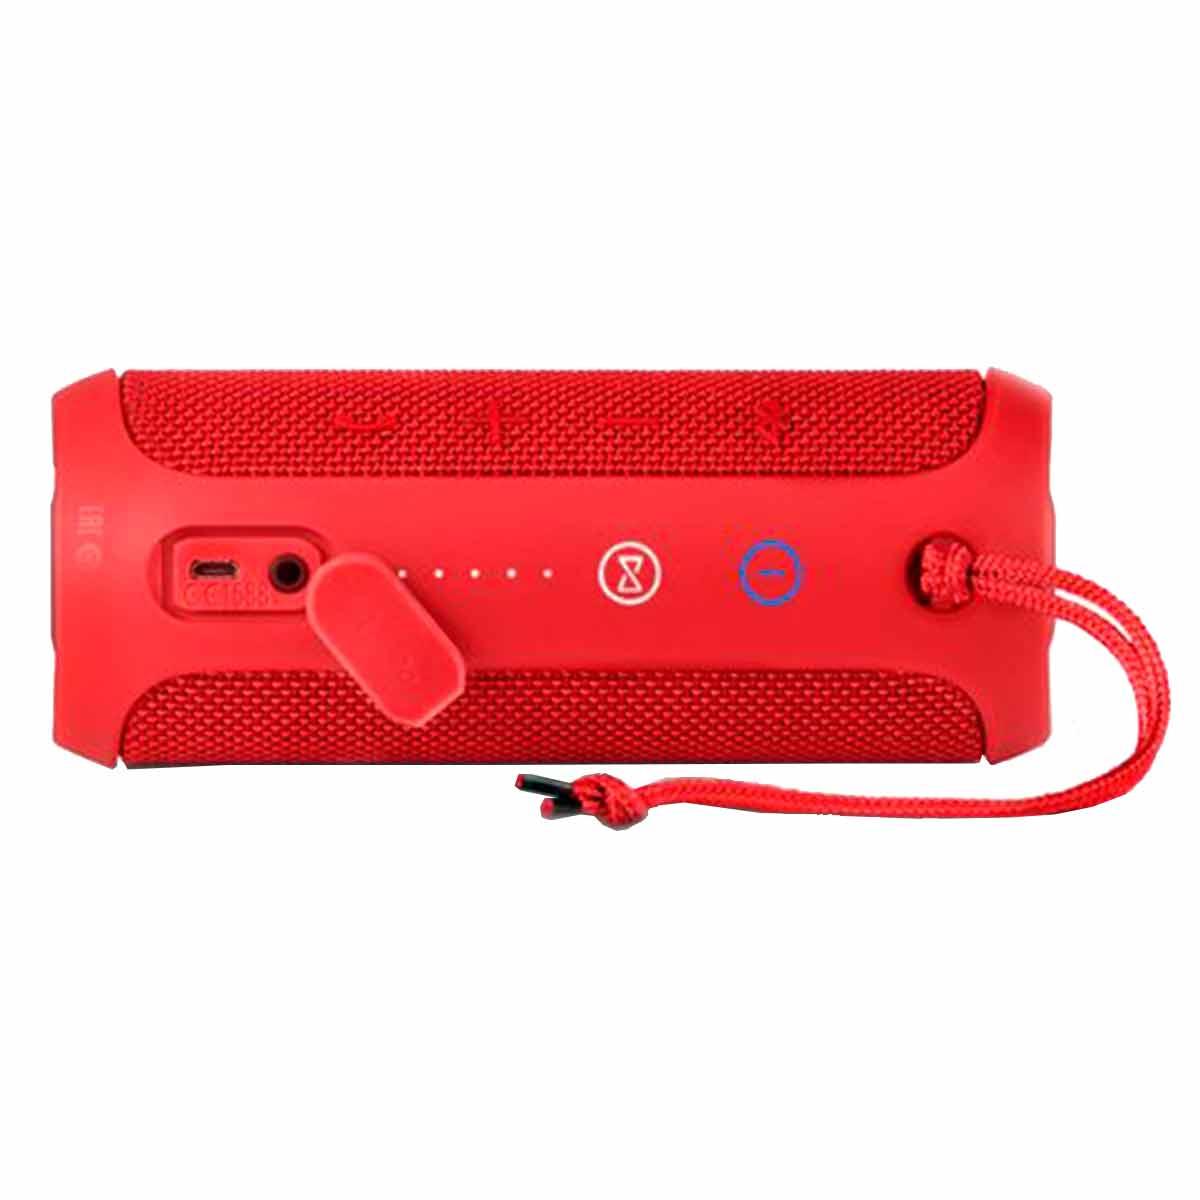 JBLFLIP3 - Caixa de Som Portátil 16W c/ Bluetooth JBL FLIP3 Vermelho - JBL